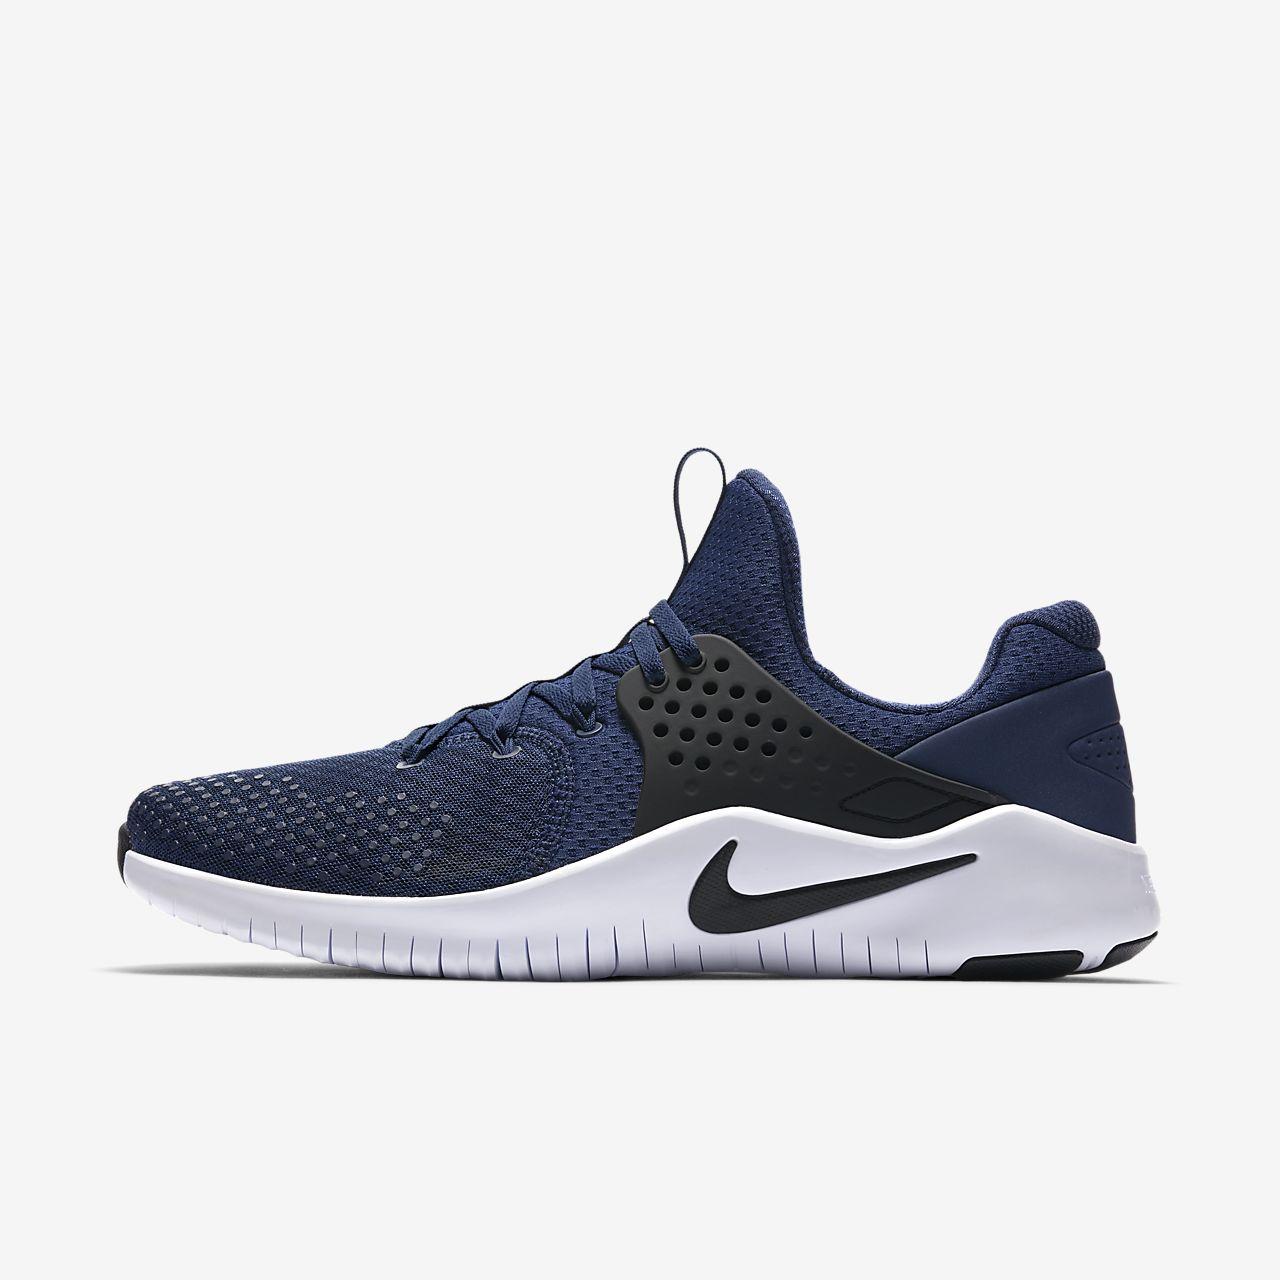 ... Chaussure de training Nike Free TR8 (Team) pour Homme